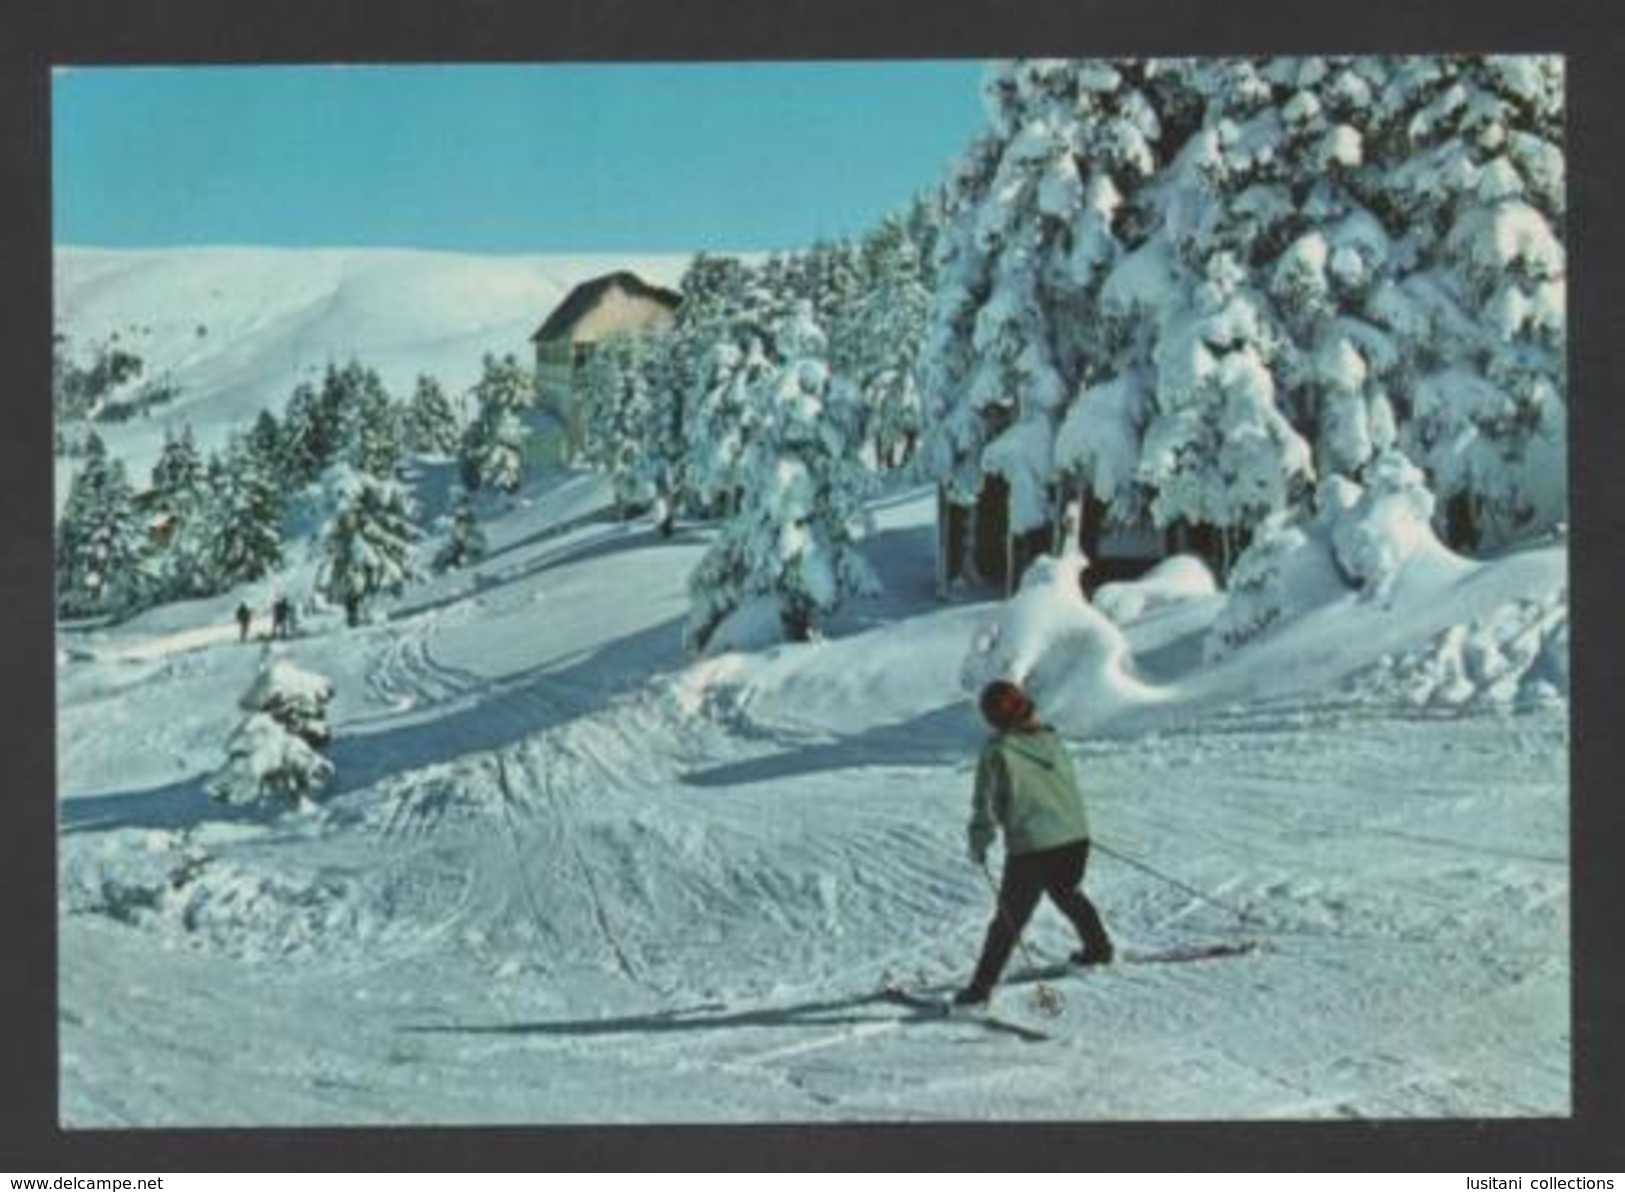 Postcard TURKEY TURQUIE A. YESIL BURSA ULUDAG &  SKIY SKIING WINTER SPORTS 1960s - Unclassified